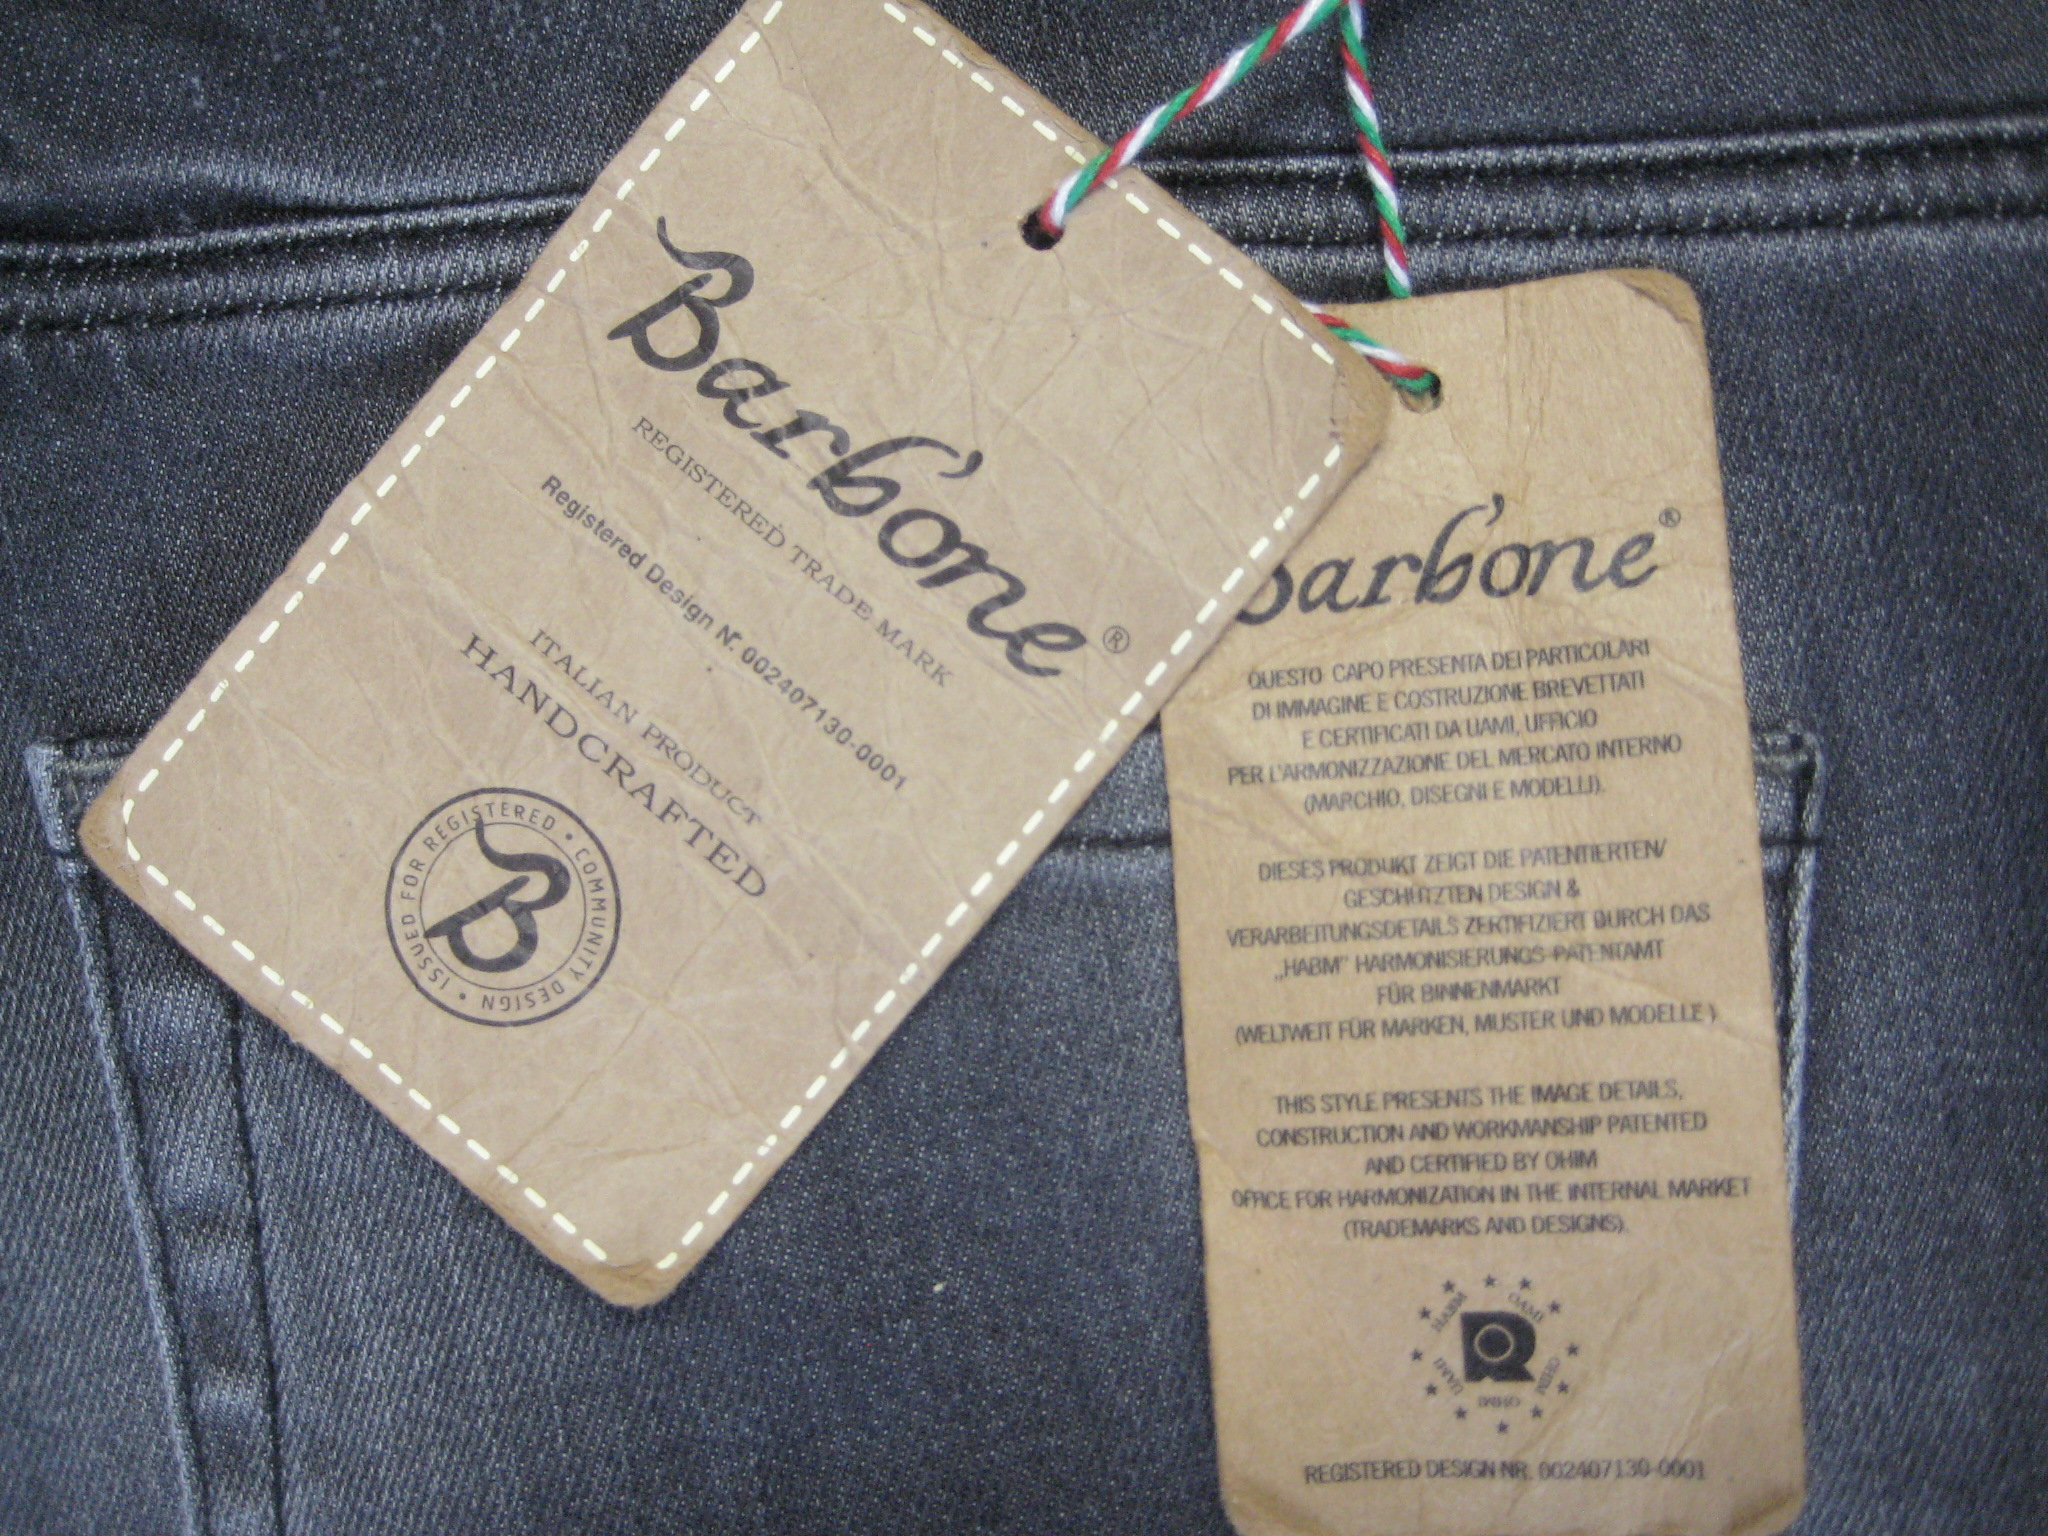 Barb´One by Lucky de Luca Designer Herren Jeans Sly 5 Pocket Denim Schwarz Grau Stretch